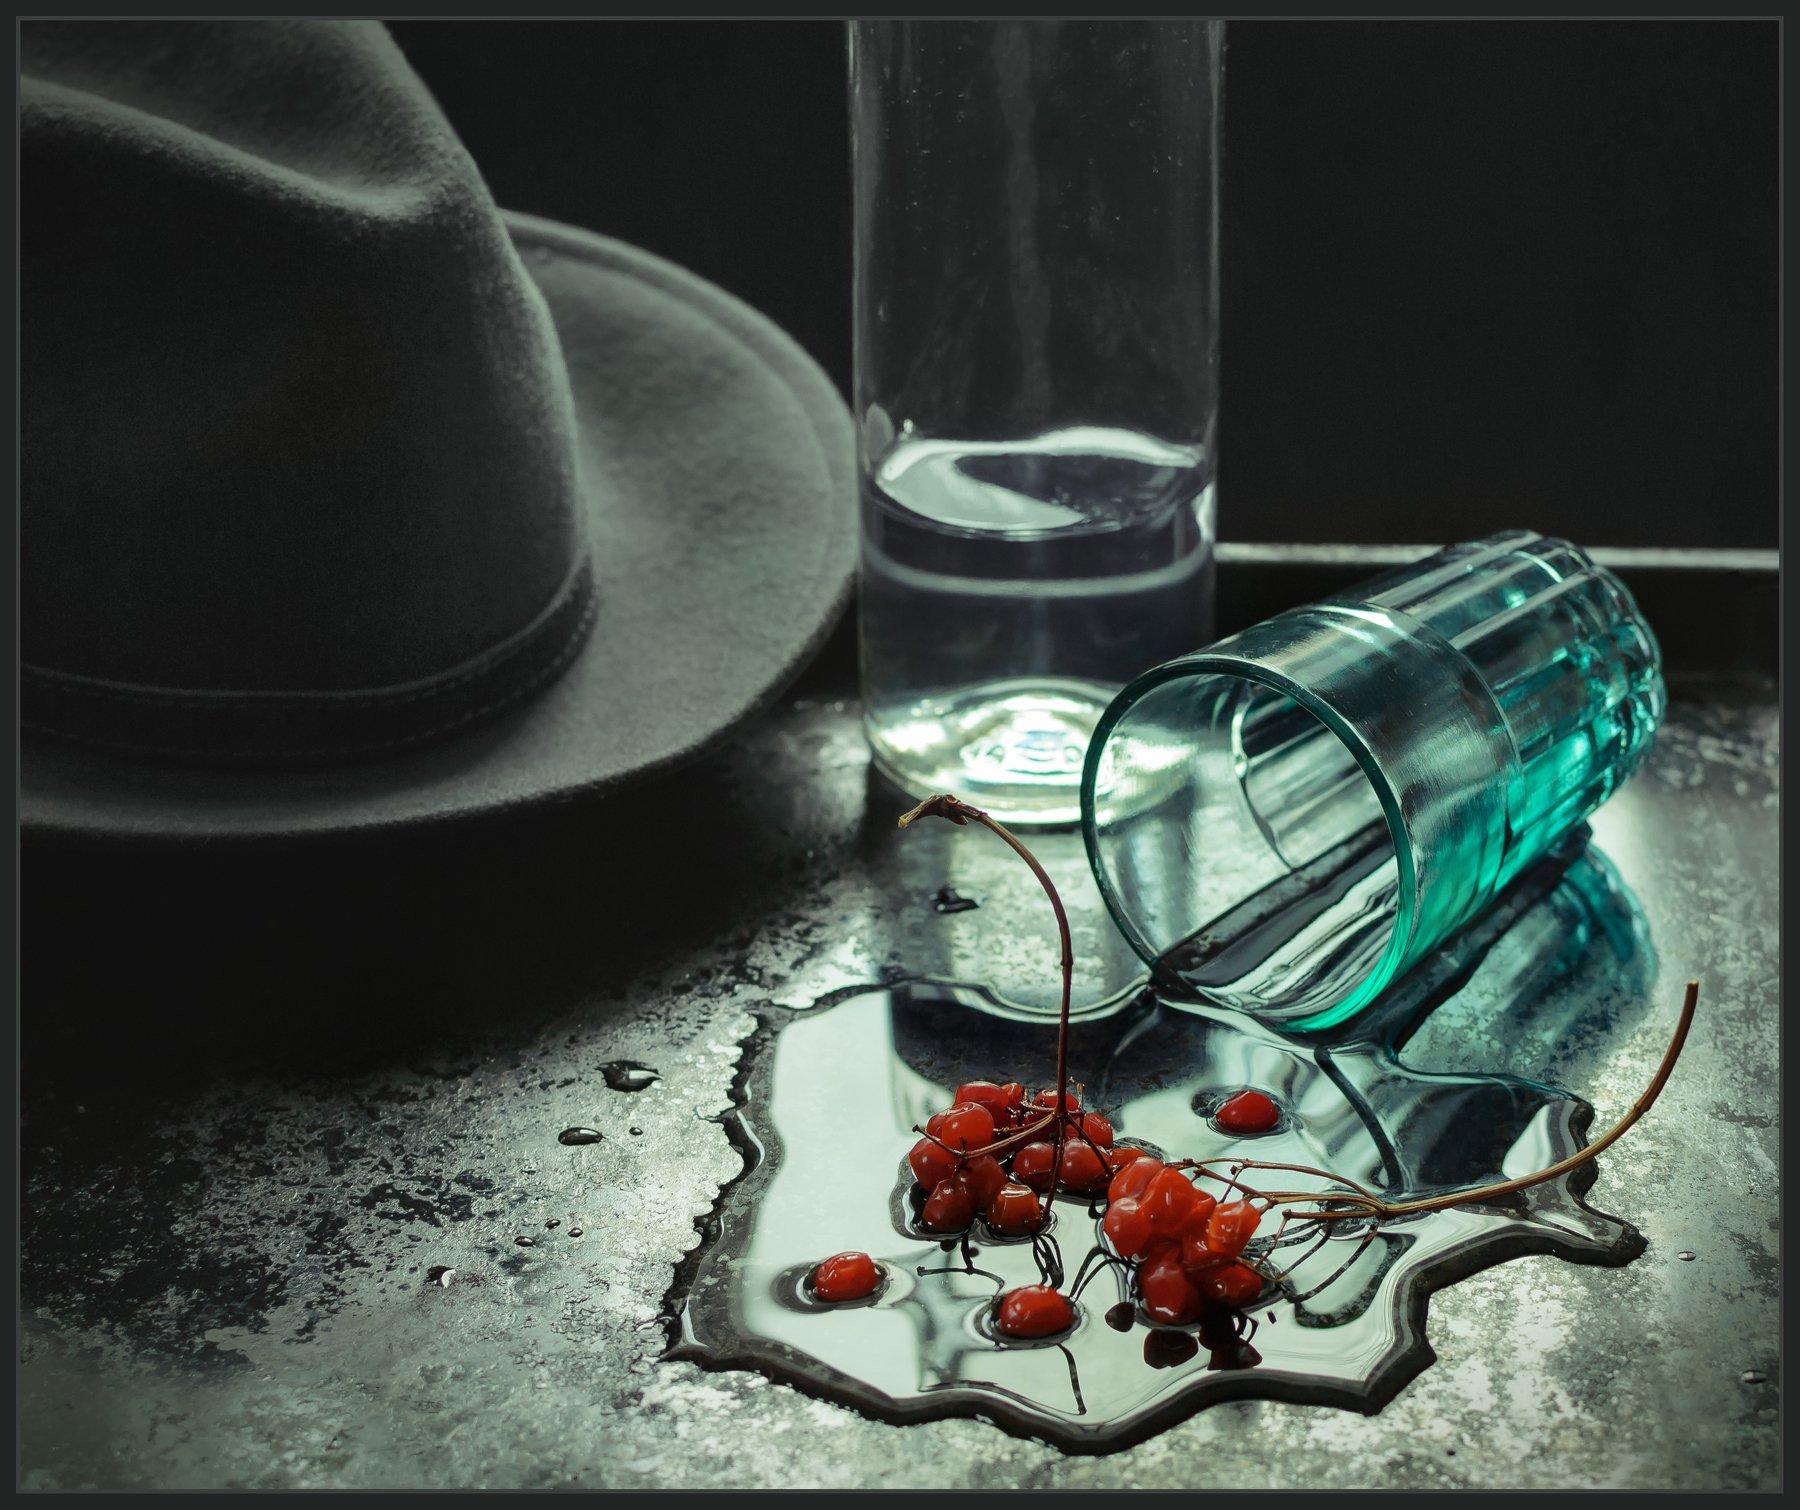 натюрморт, still life, калина, стакан, бутылка, шляпа, Андрей Угренинов